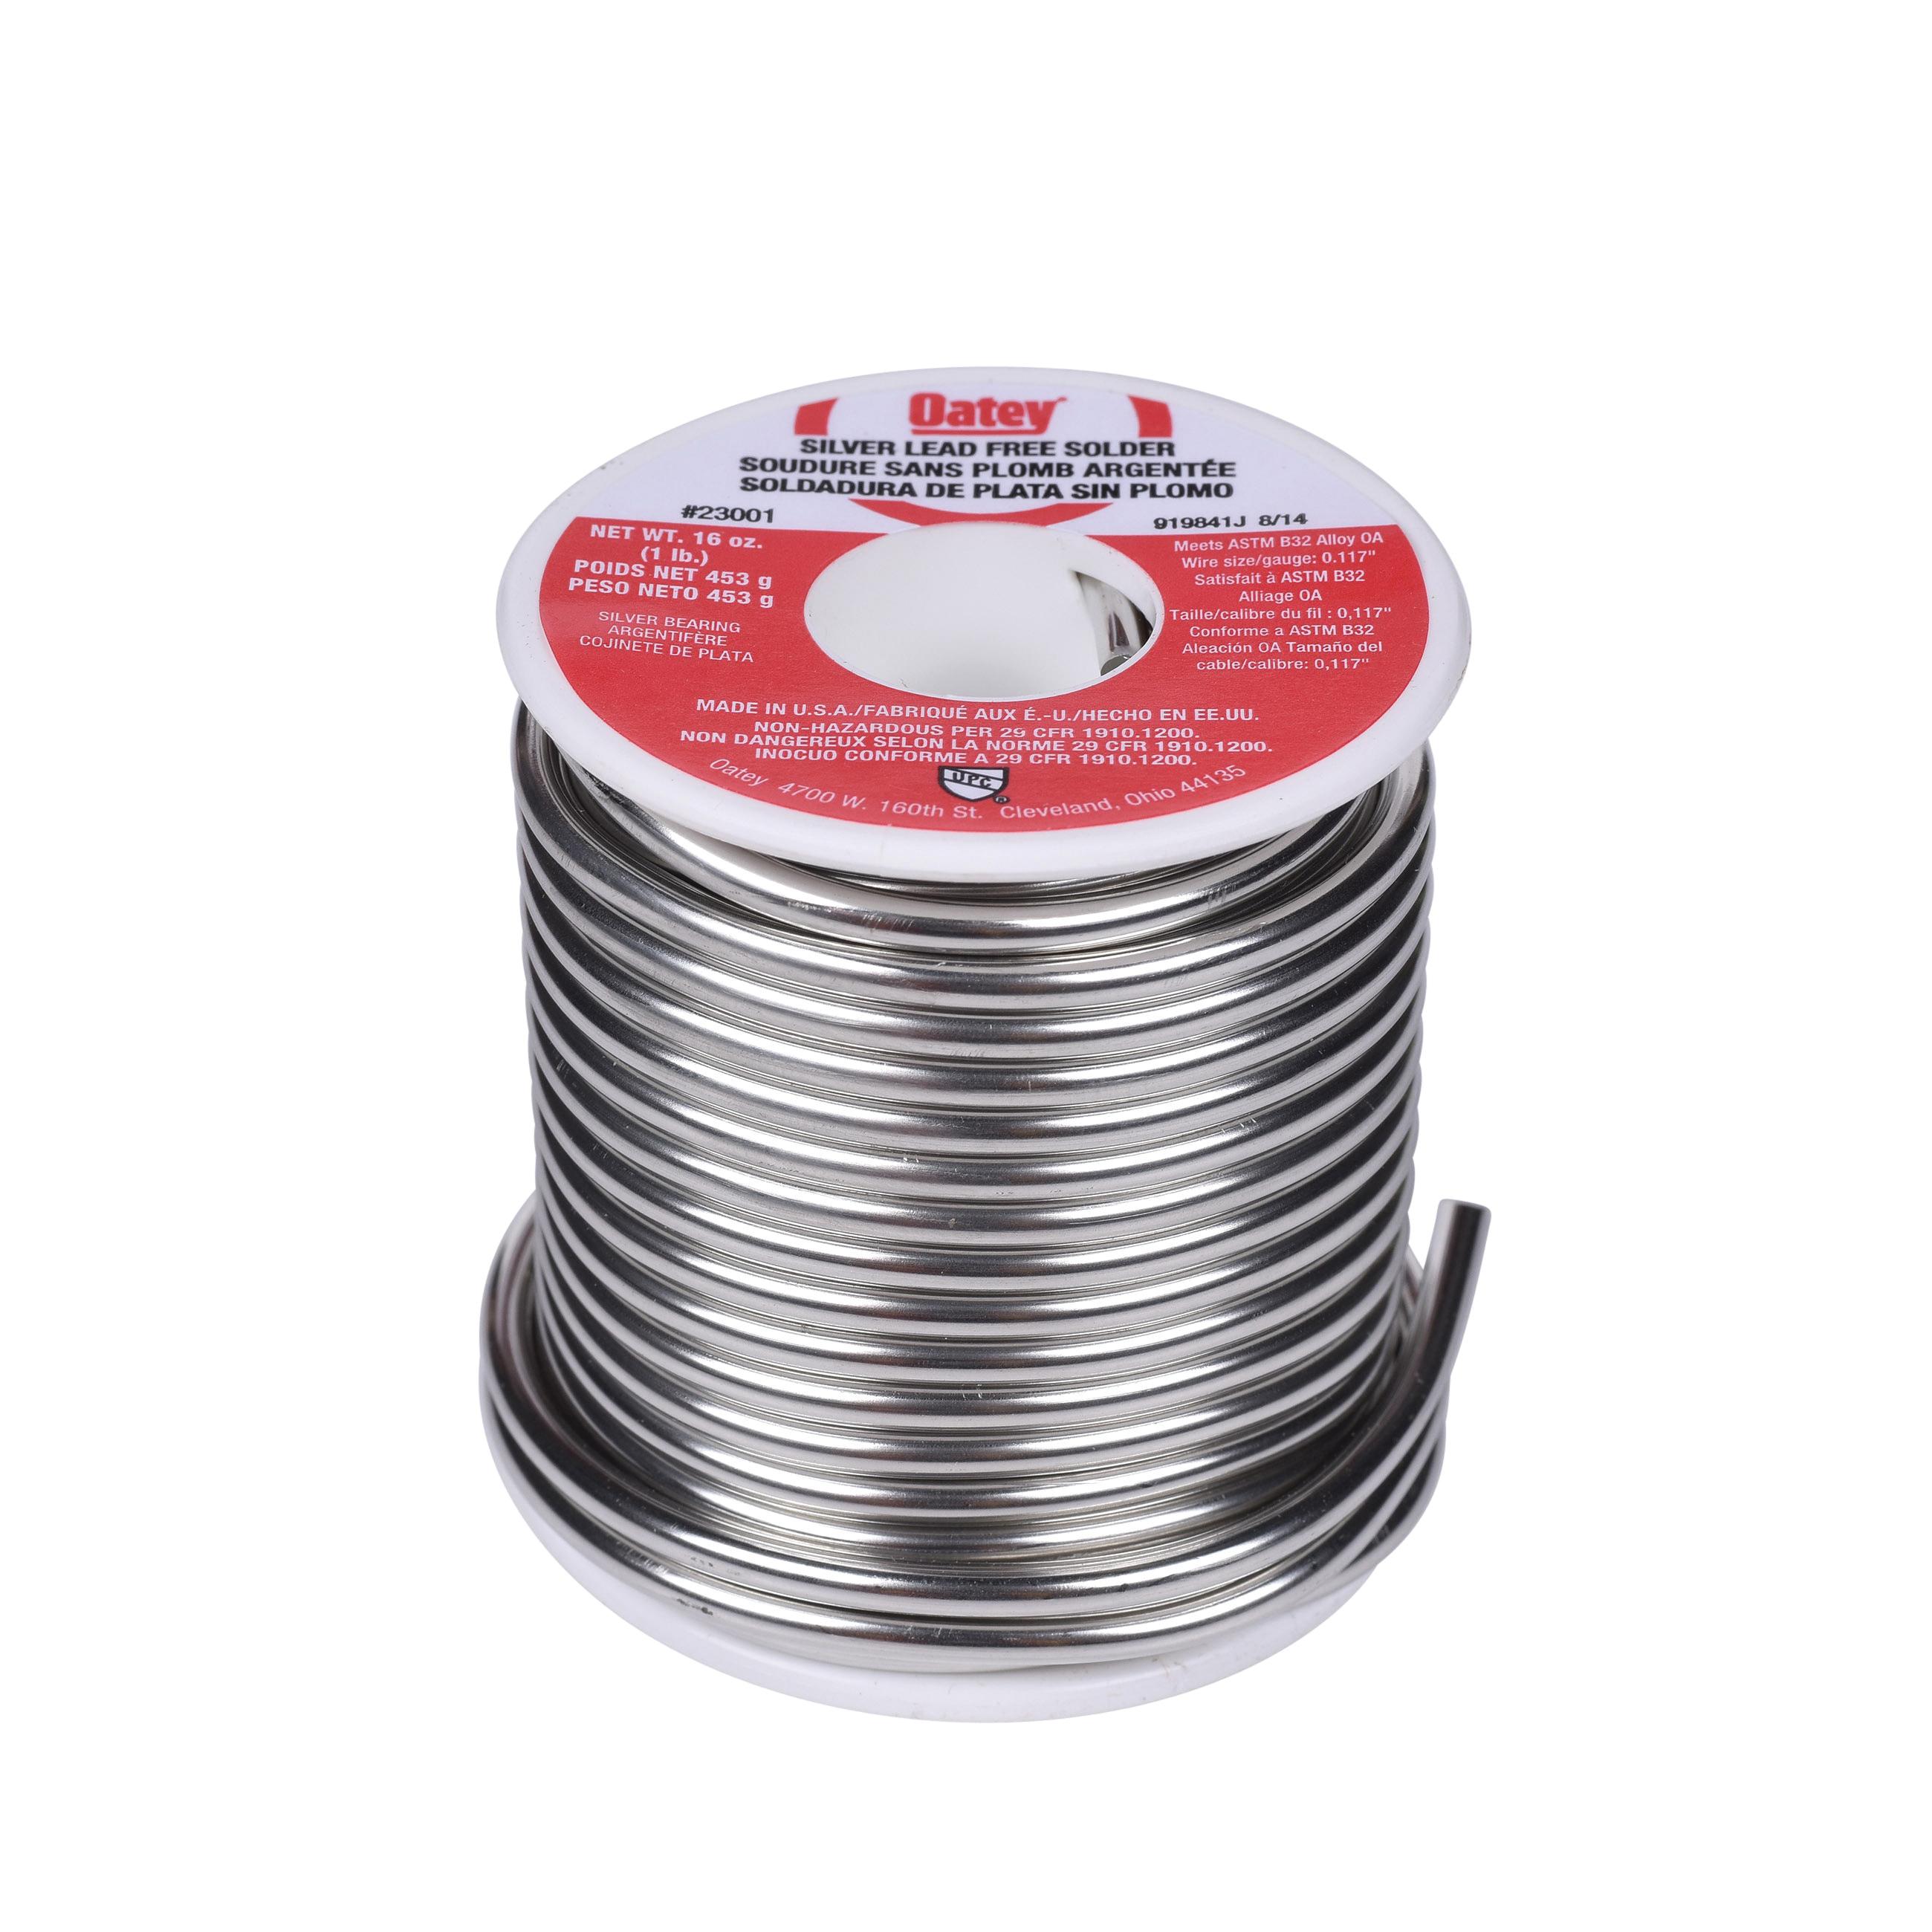 Oatey® 23001 Silver Wire Solder, 420 to 460 deg F Melting, 1 lb, Alloy